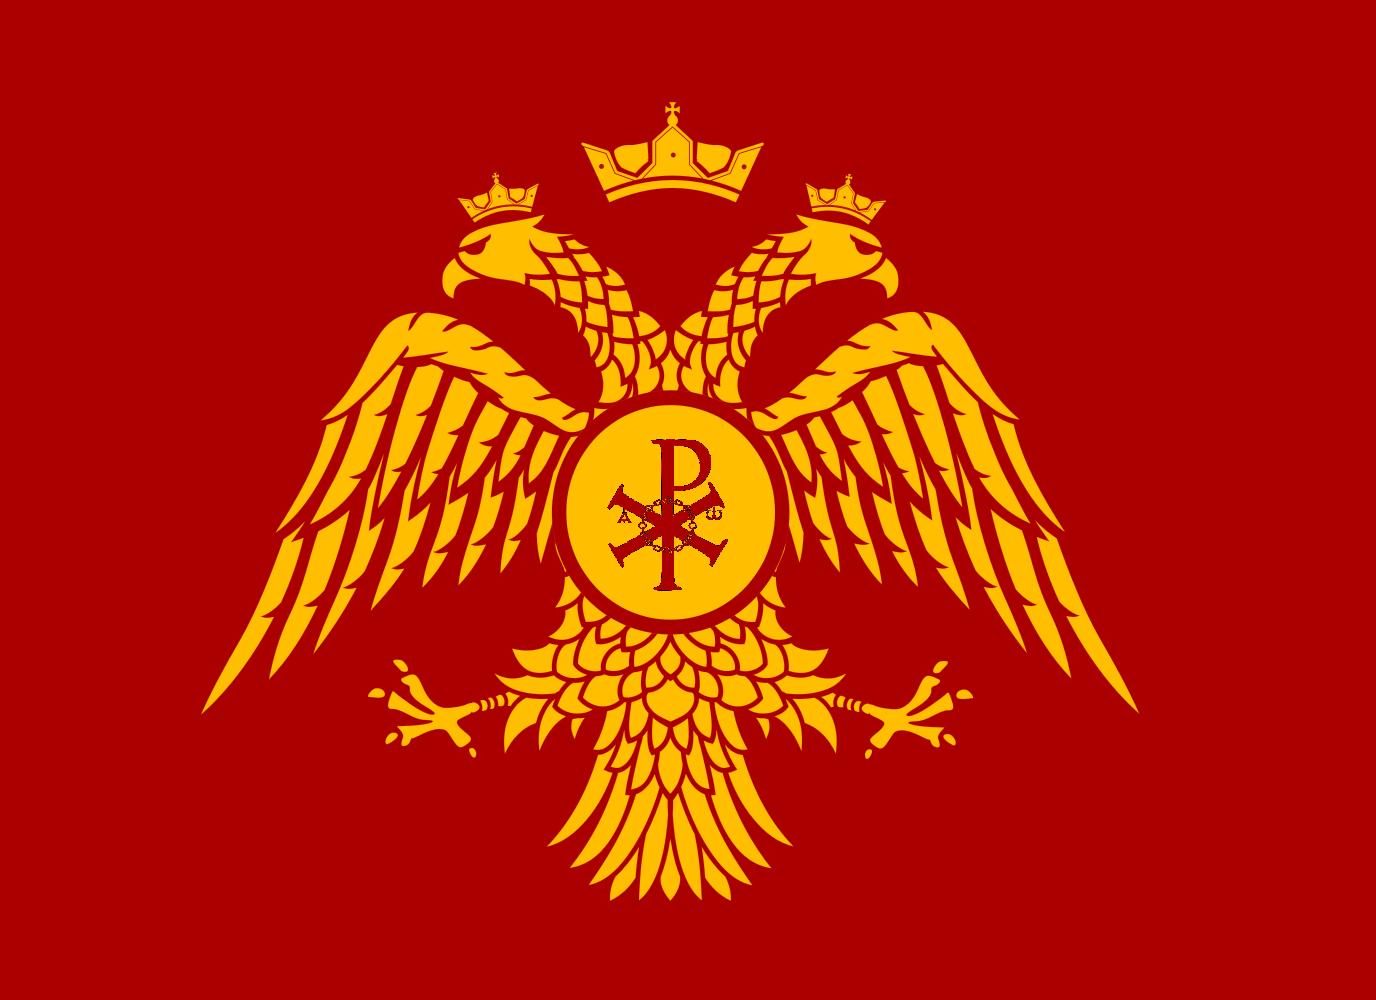 Image Flag Of The Roman Empire East 705 1265g Alternative